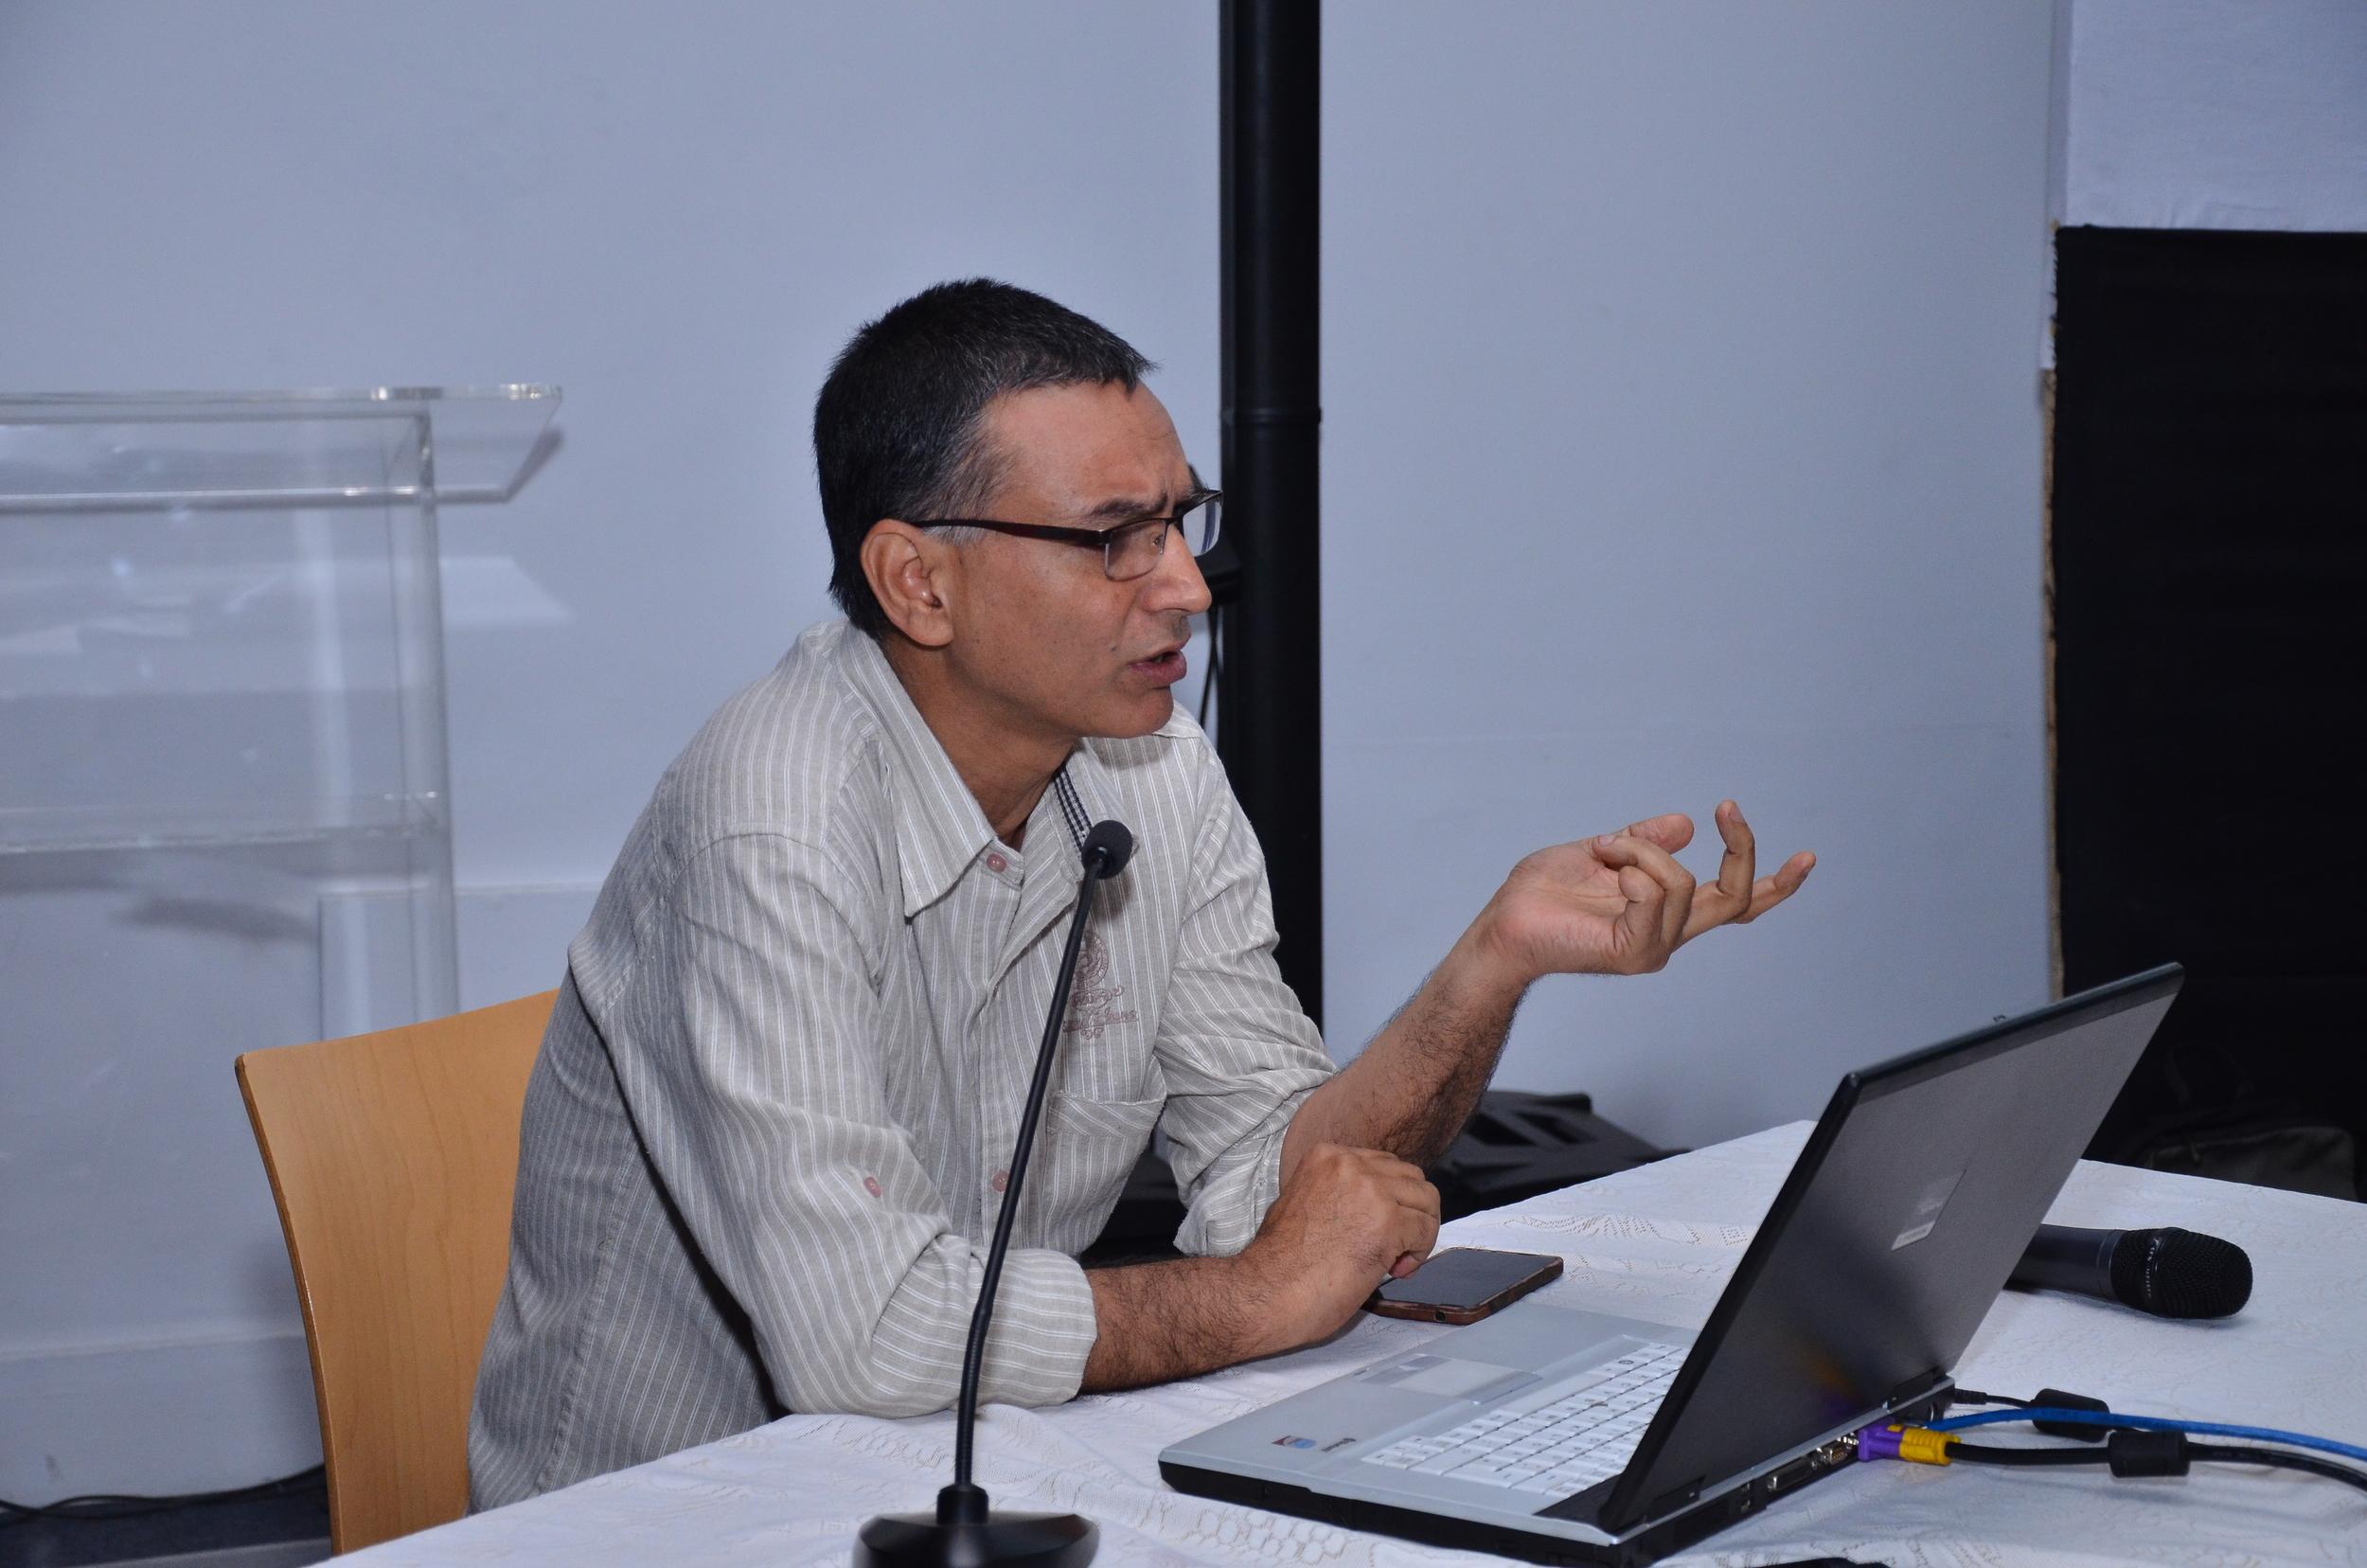 Panel 1: Speaker: Inder Salim